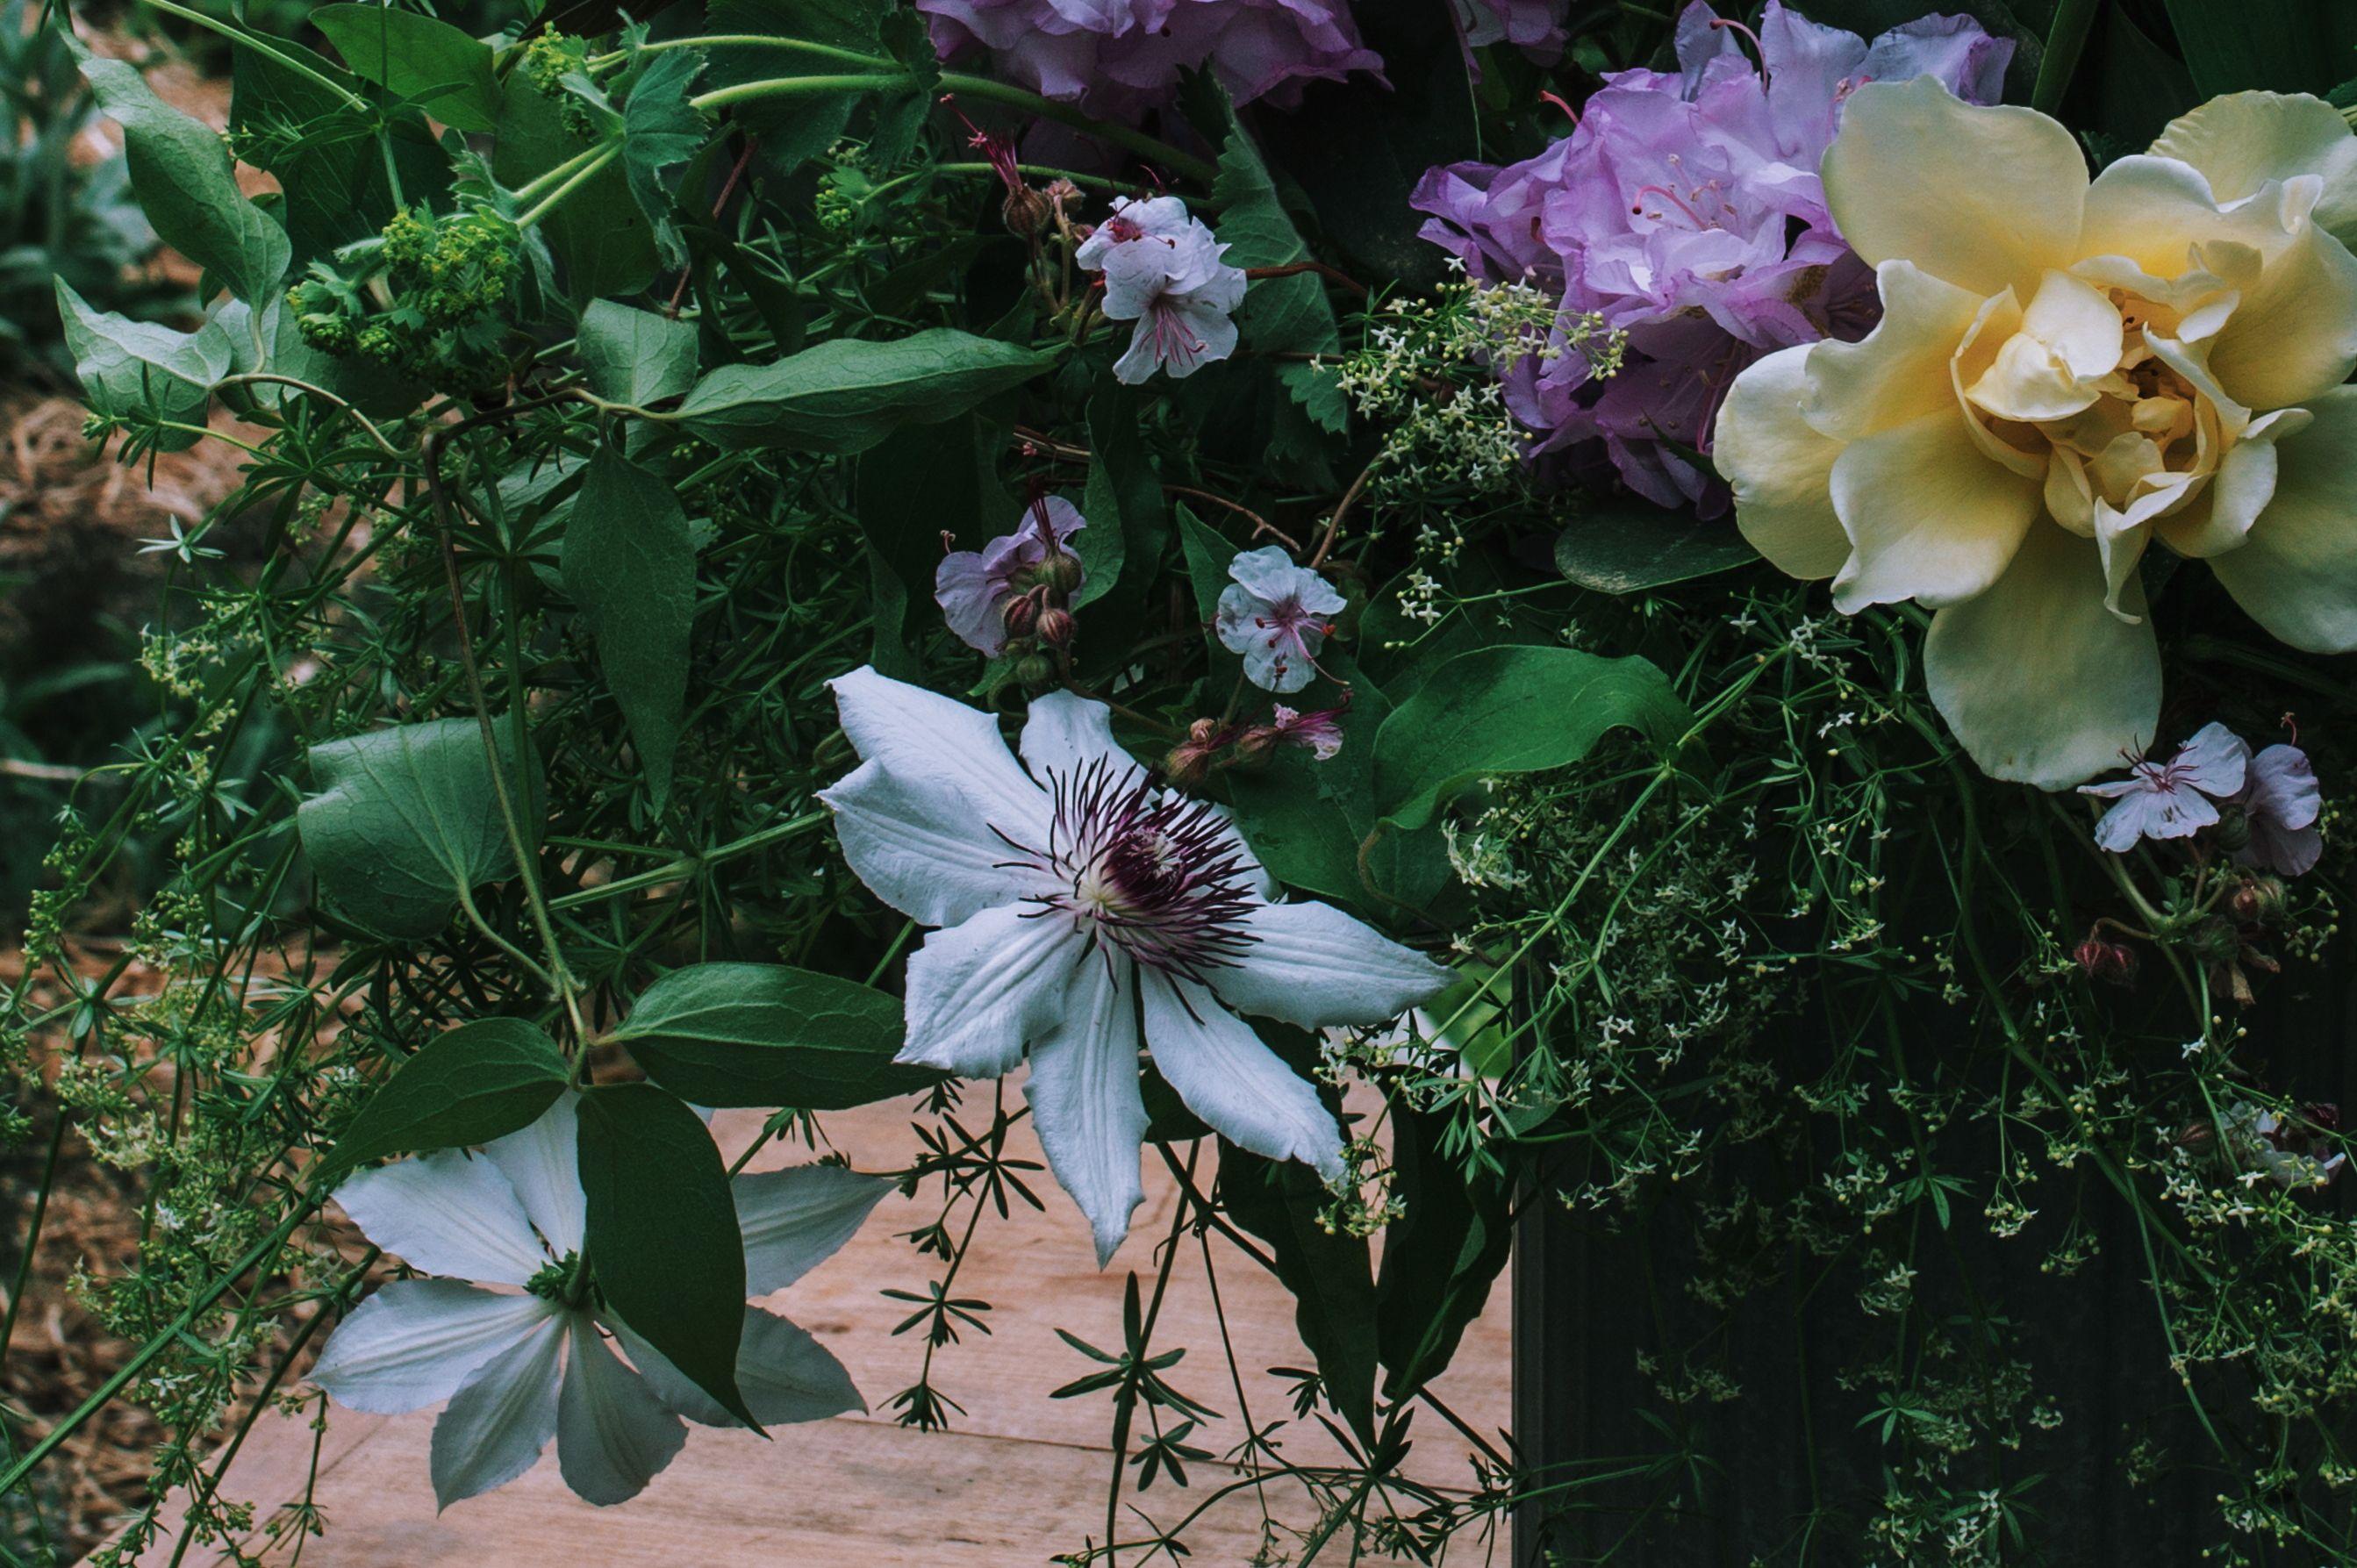 Its Spring Gardening Season And My Farmhouse Garden In The